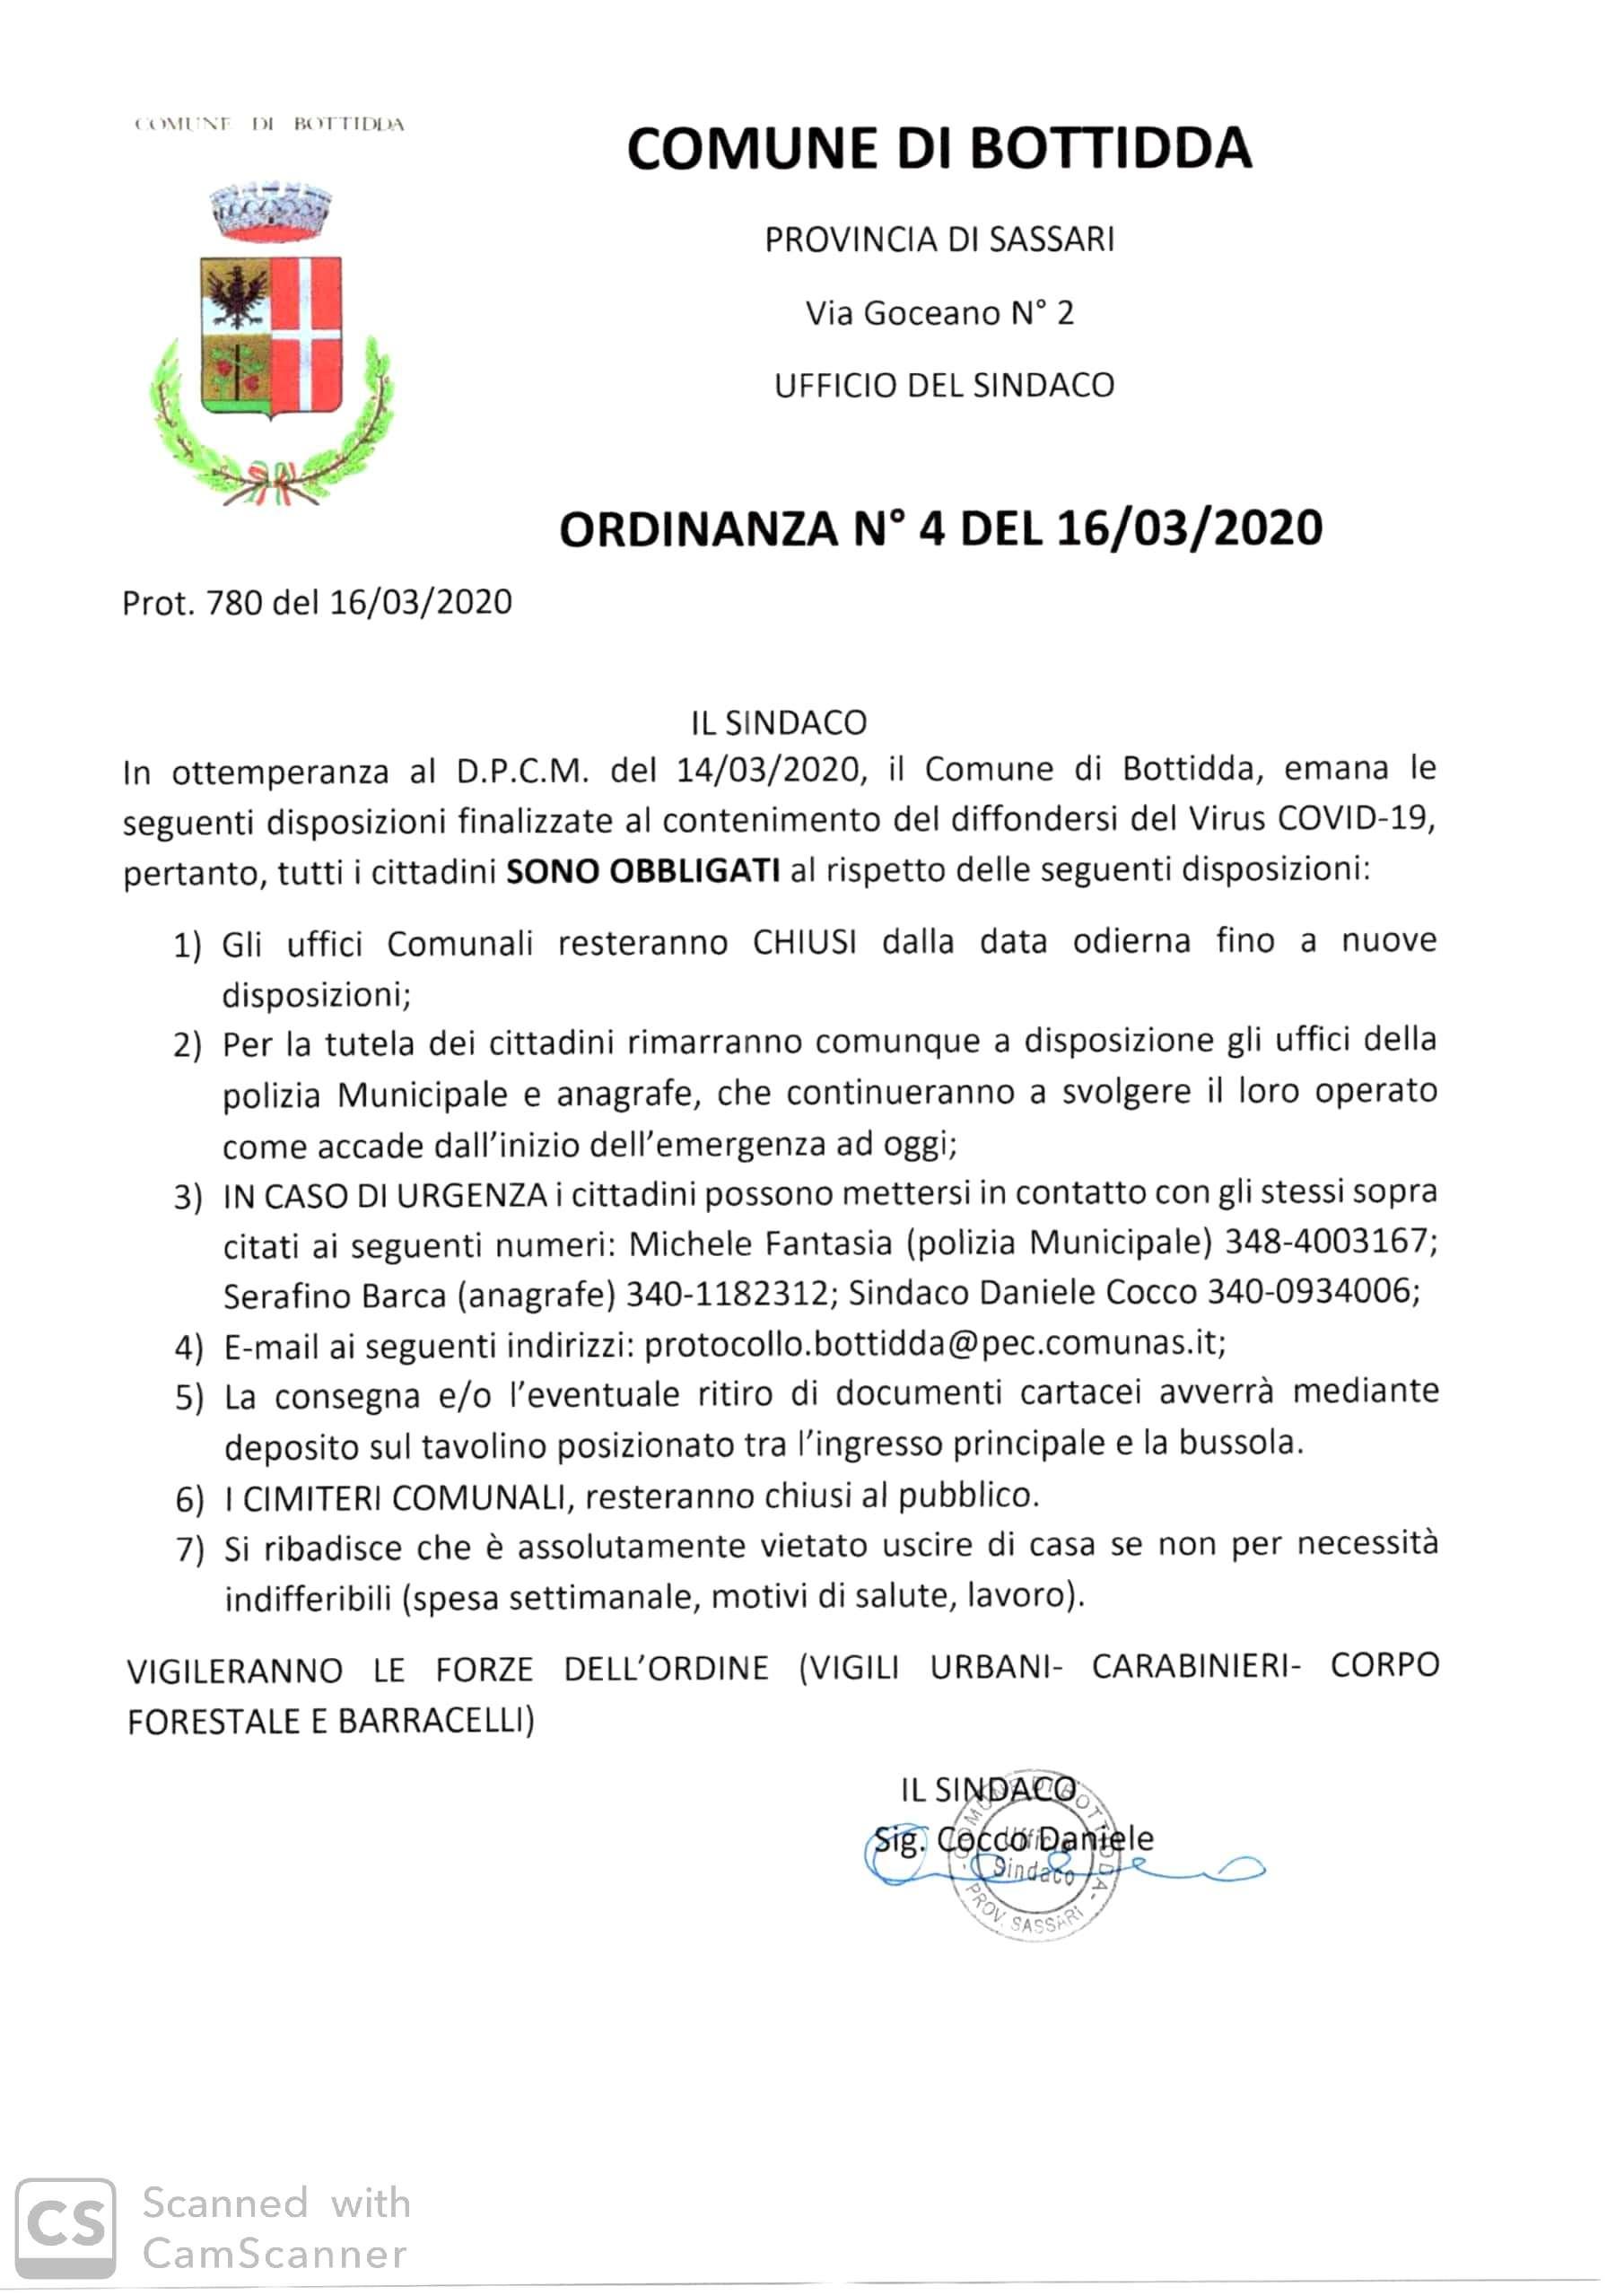 COVID-19 - ORDINANZA SINDACALE CHIUSURA UFFICI COMUNALI